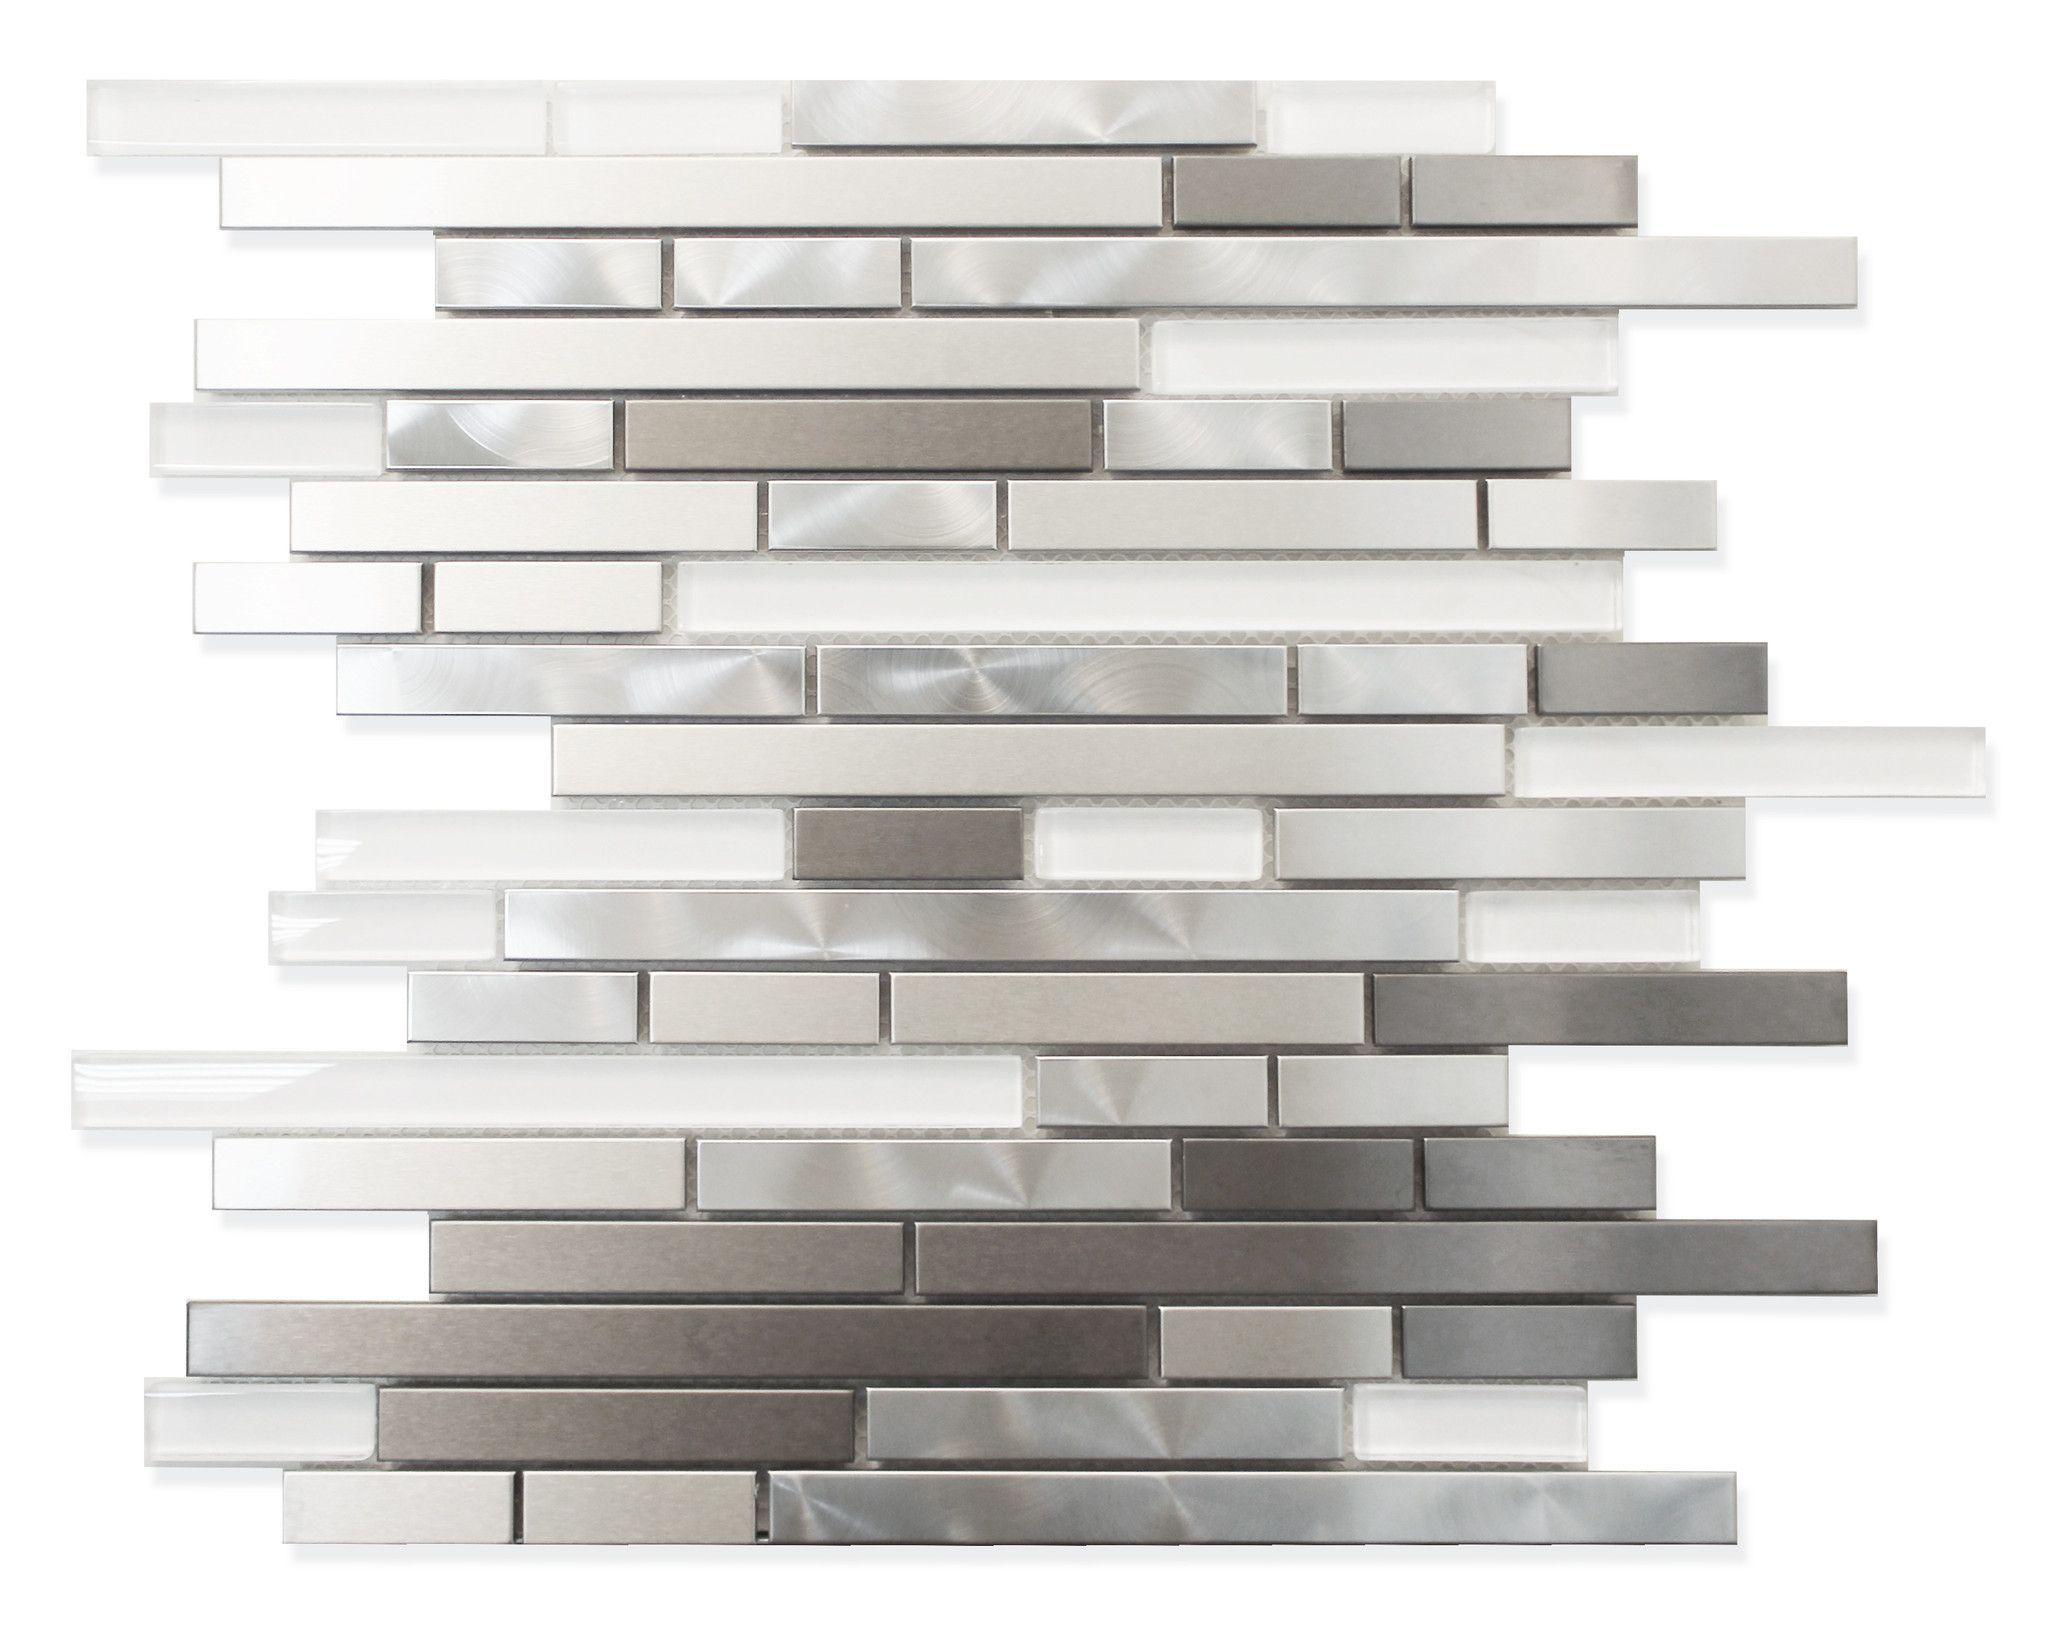 Stainless Steel And White Glass Random Strips Mosaic Tiles White Glass Mosaic Kitchen Renovation Kitchen Interior